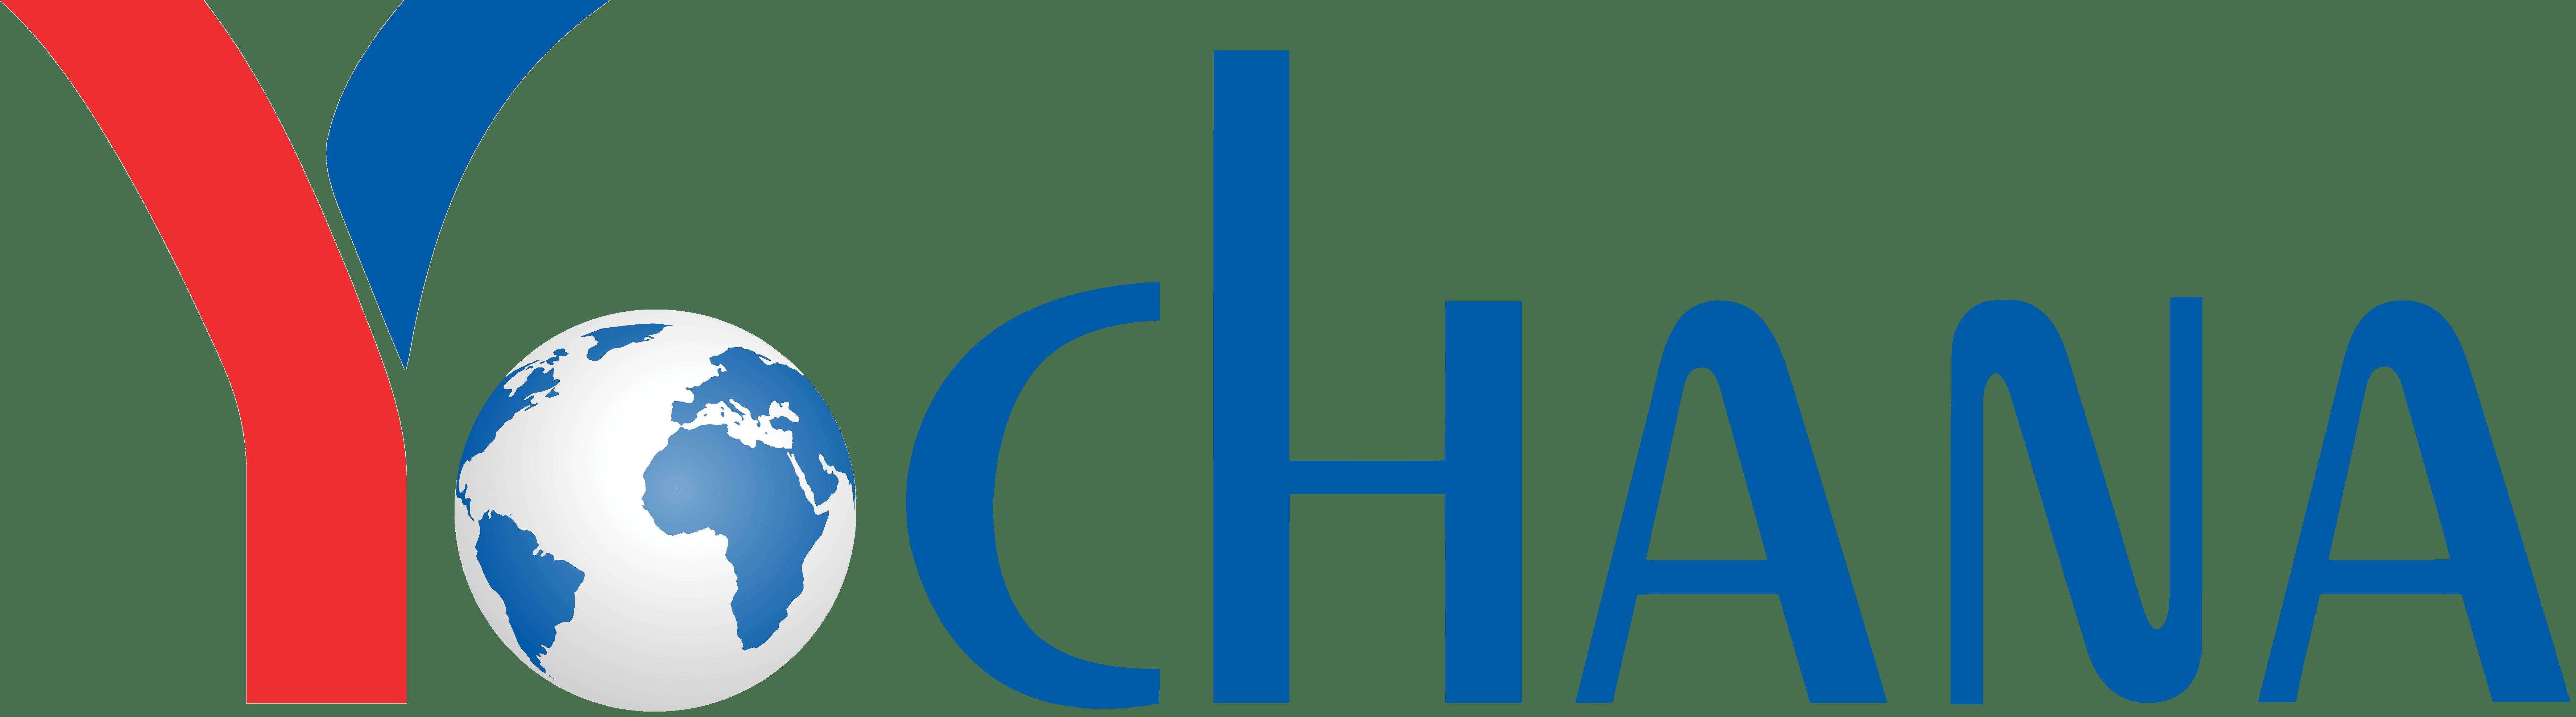 Yochana Talent Acquisition